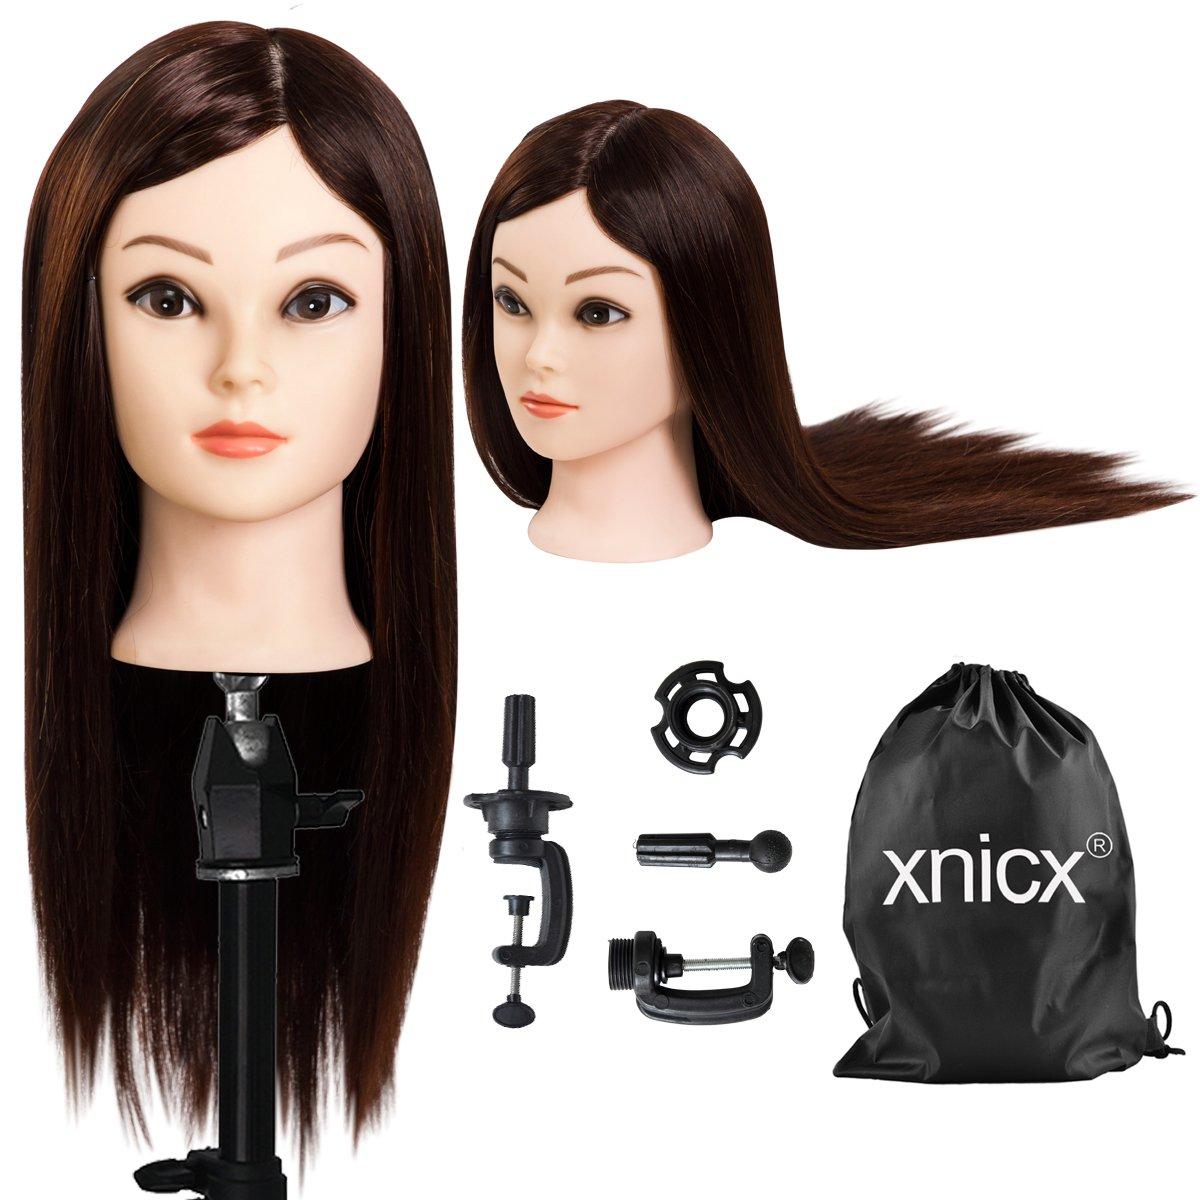 xnicx 90% Pelo real Maniquíes de aprendizaje Cabezas Peluqueria Cabezote Cabello Marrón oscuro